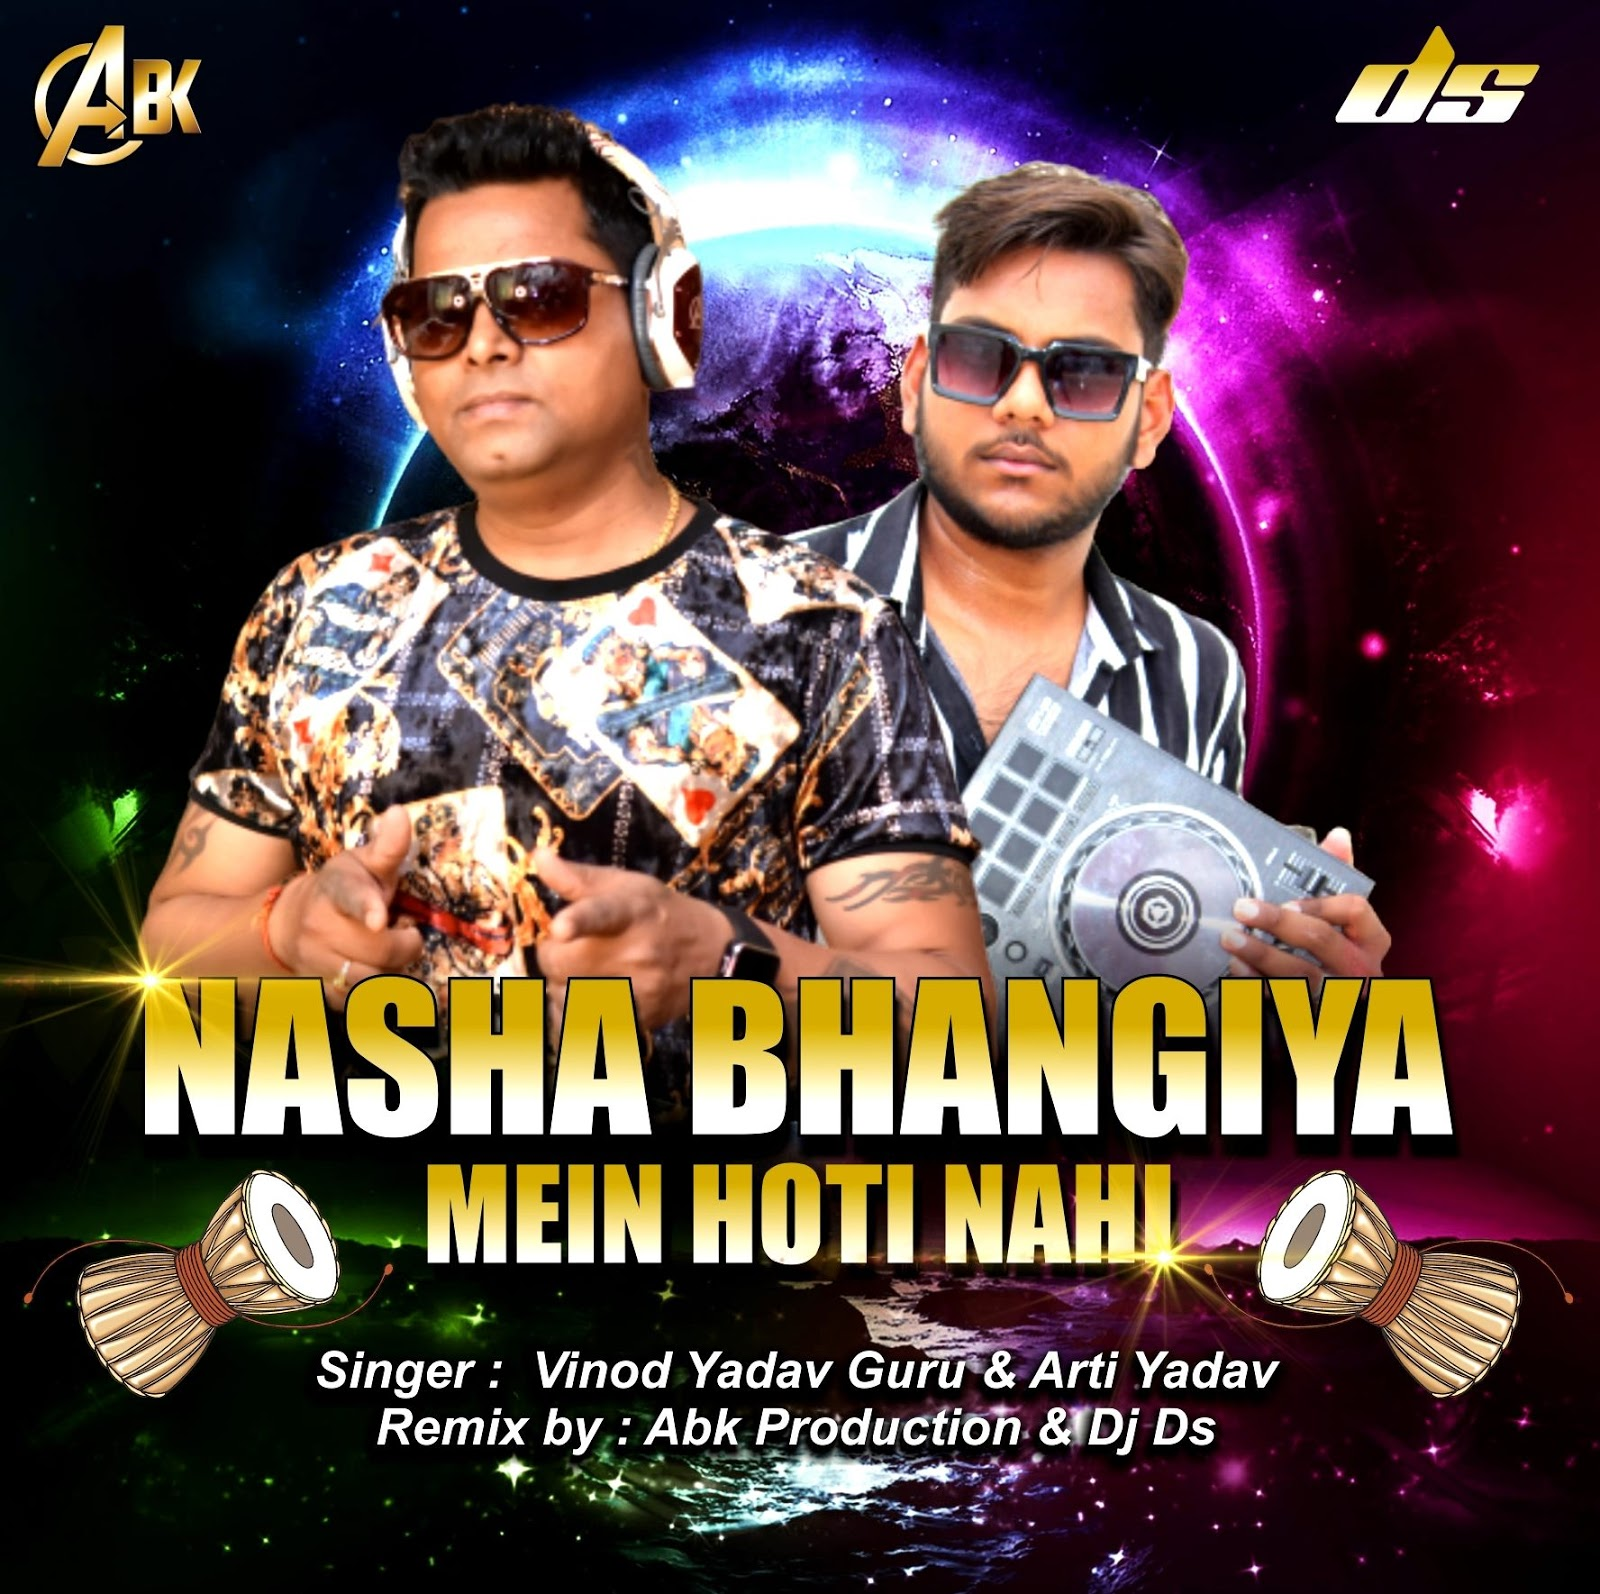 Nasha bhangiya